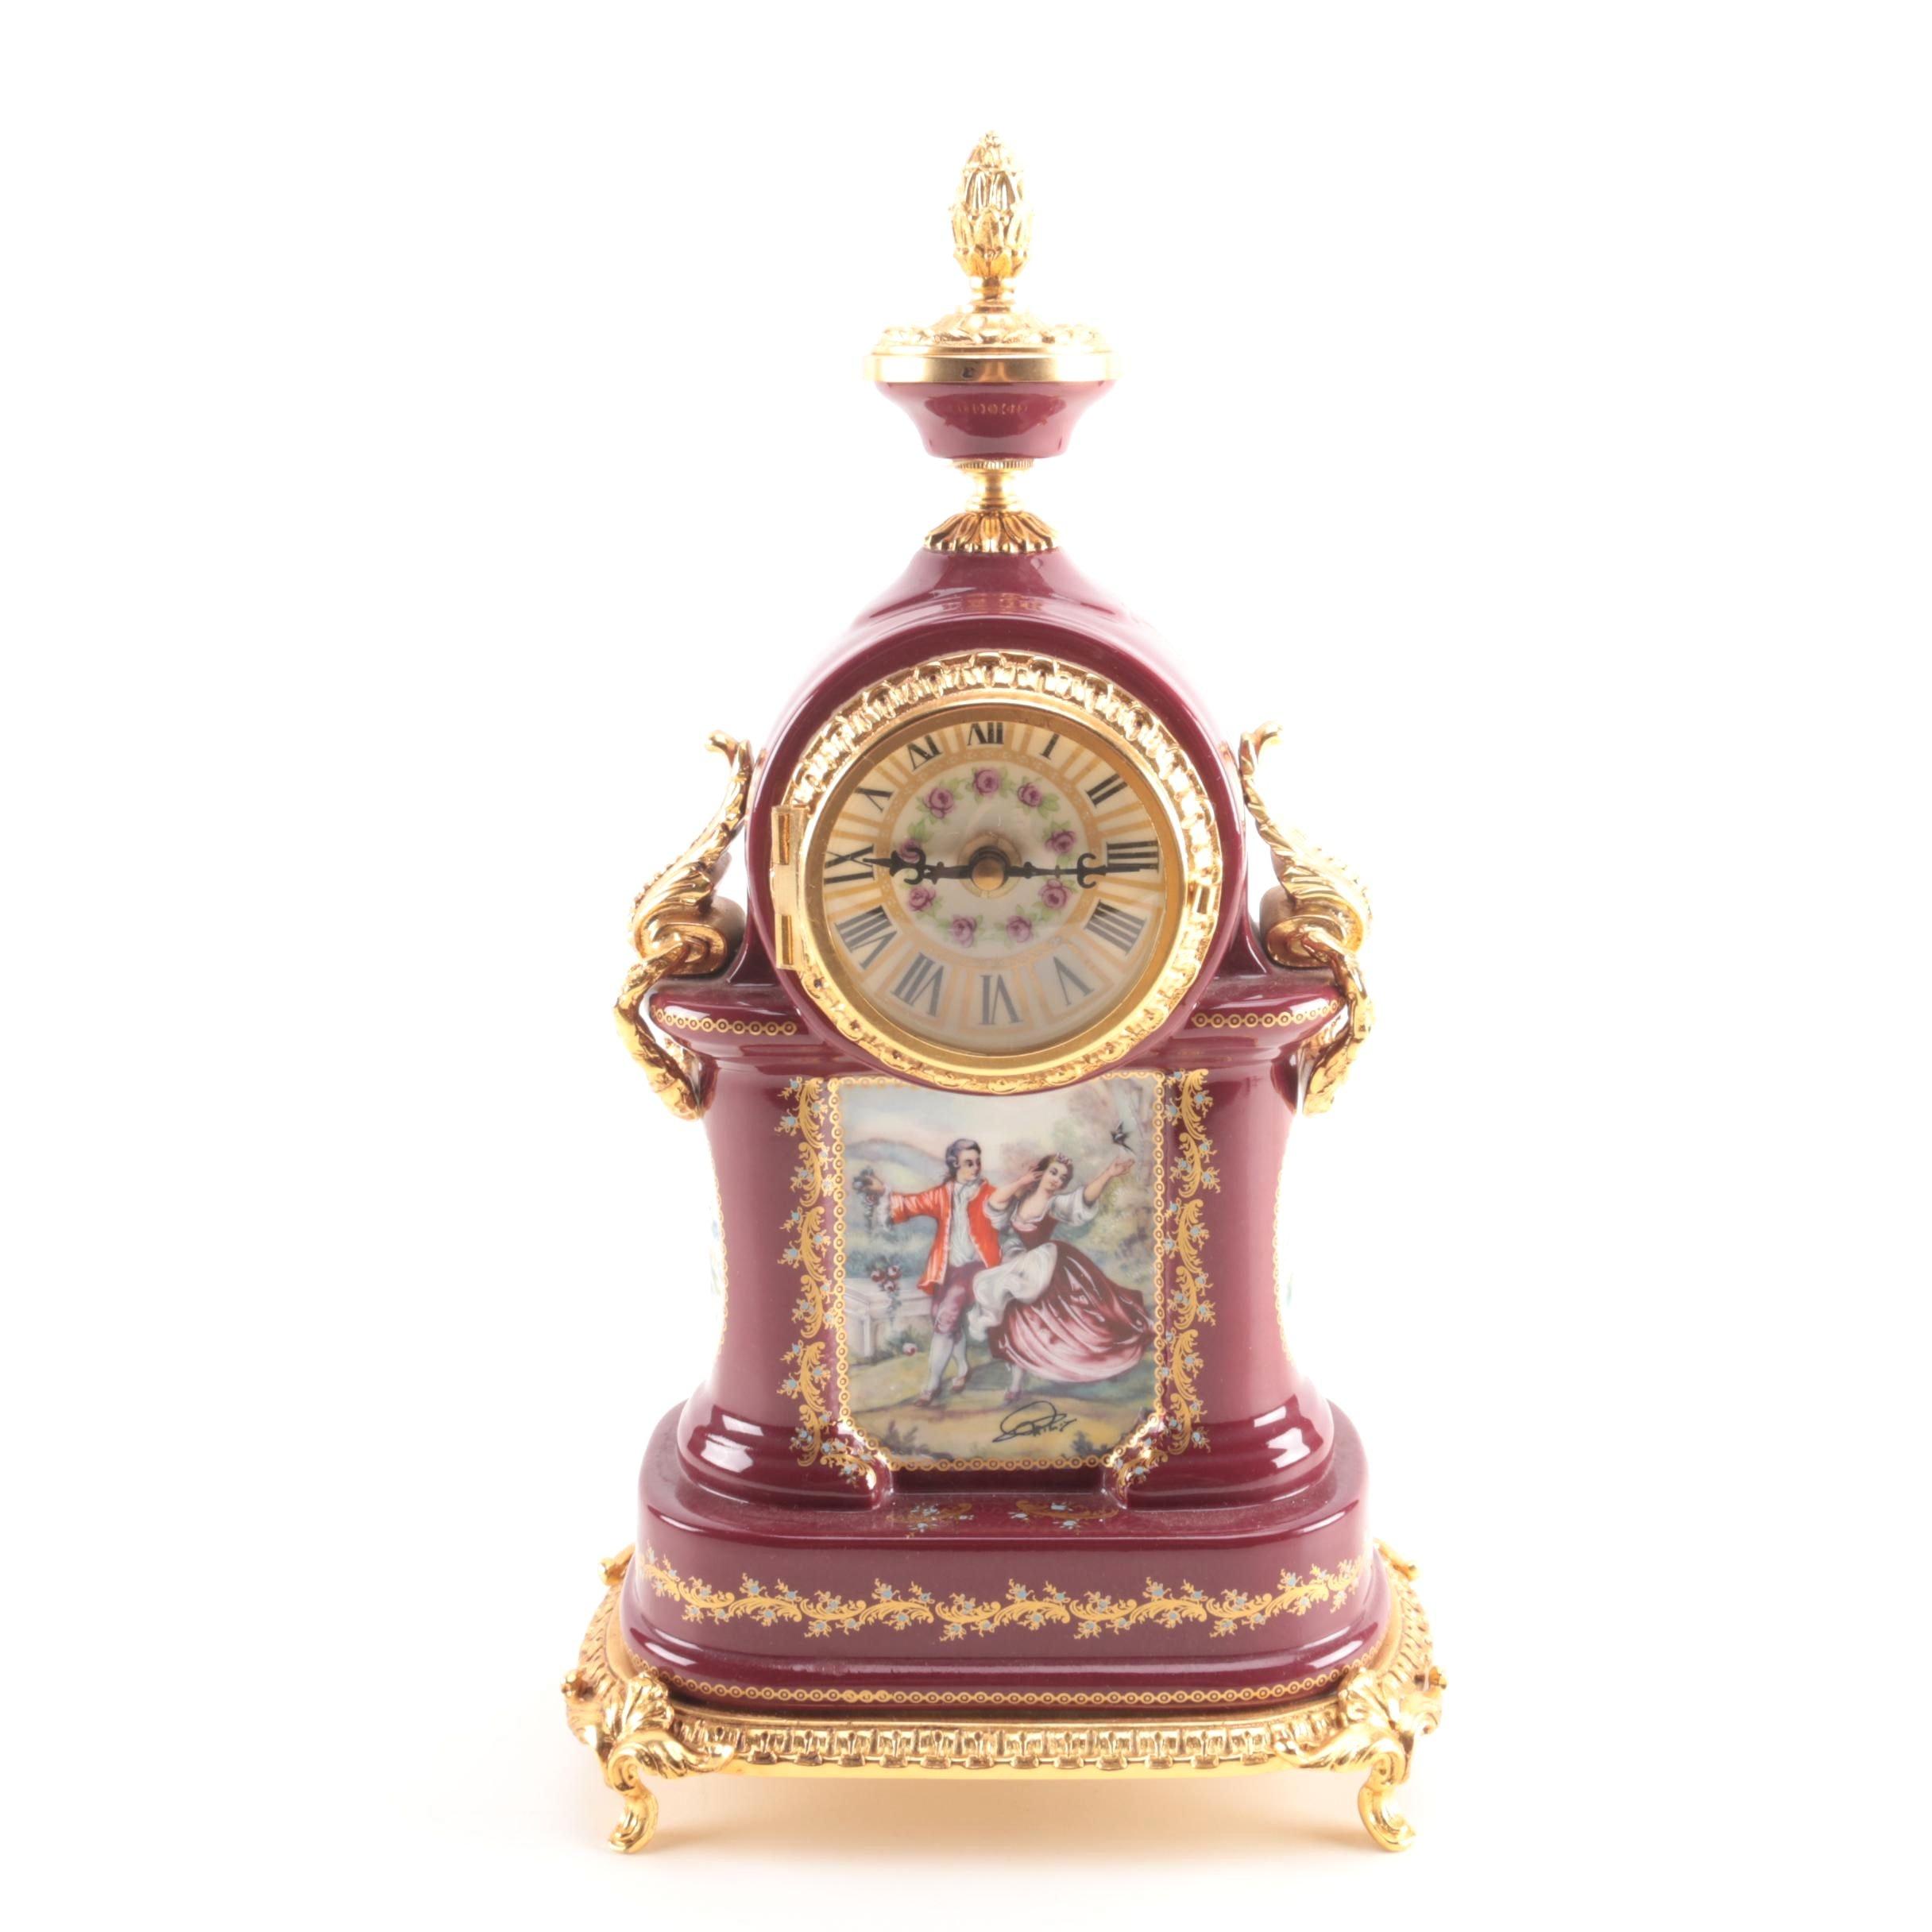 Decorative Purple and Gold Tone Ceramic Clock